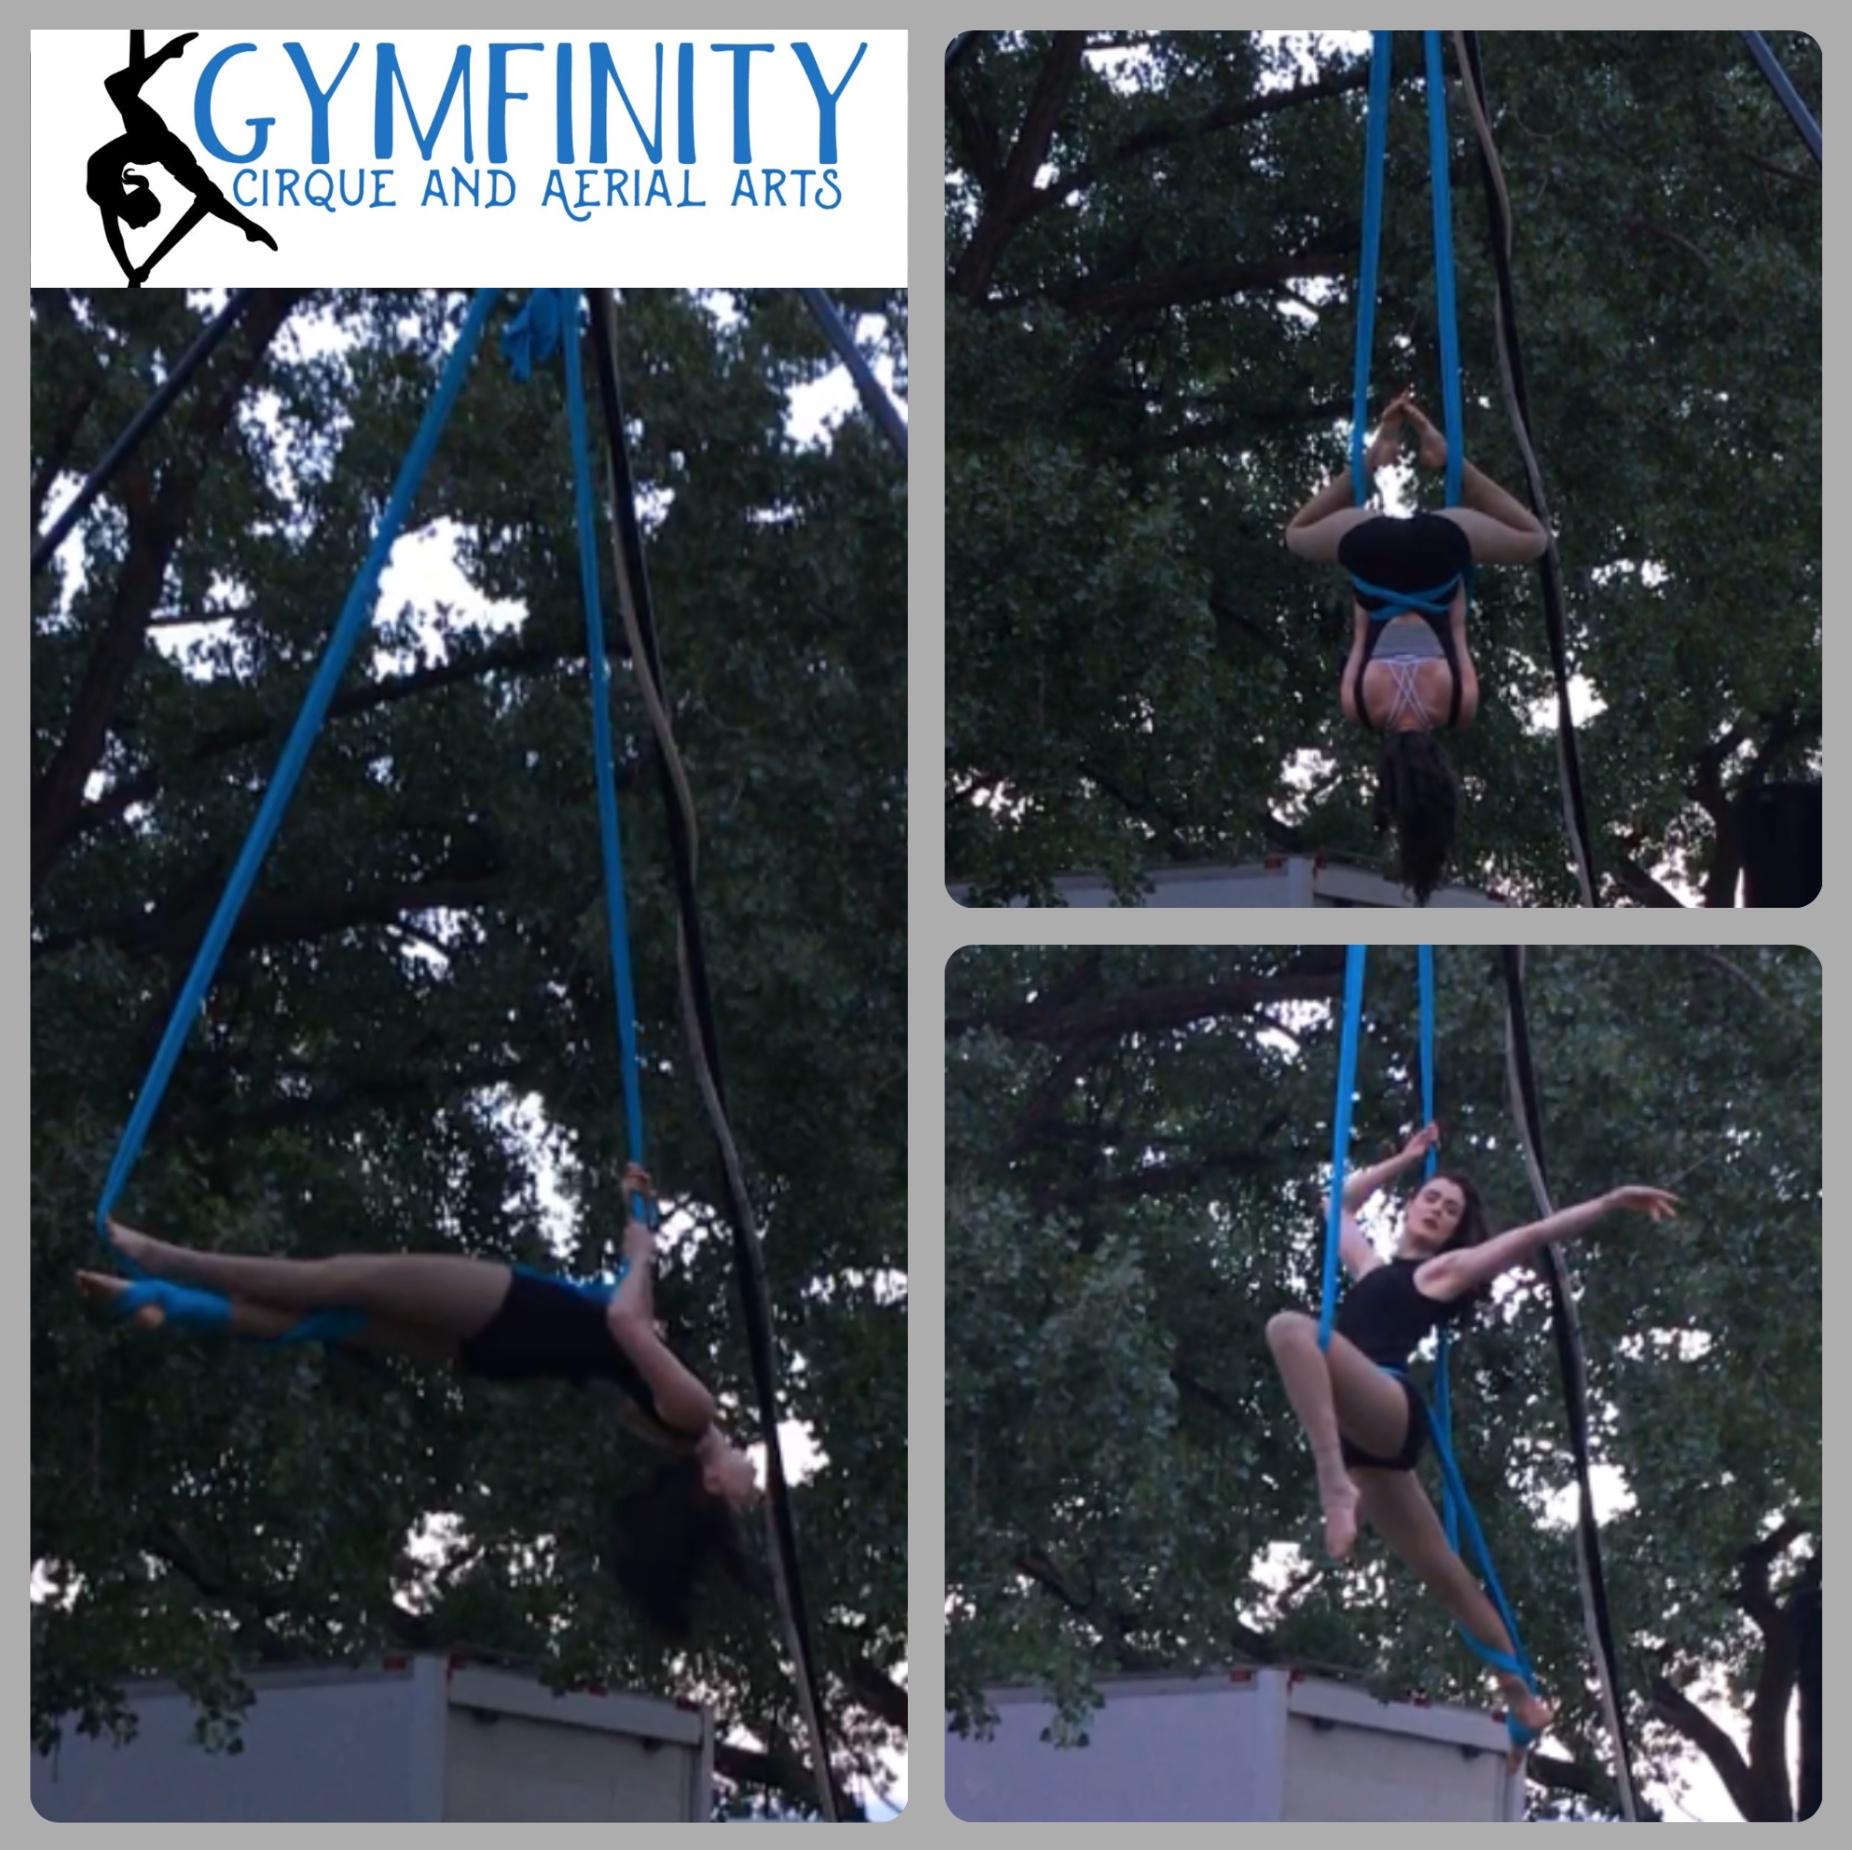 Gymfinity Promo.jpeg